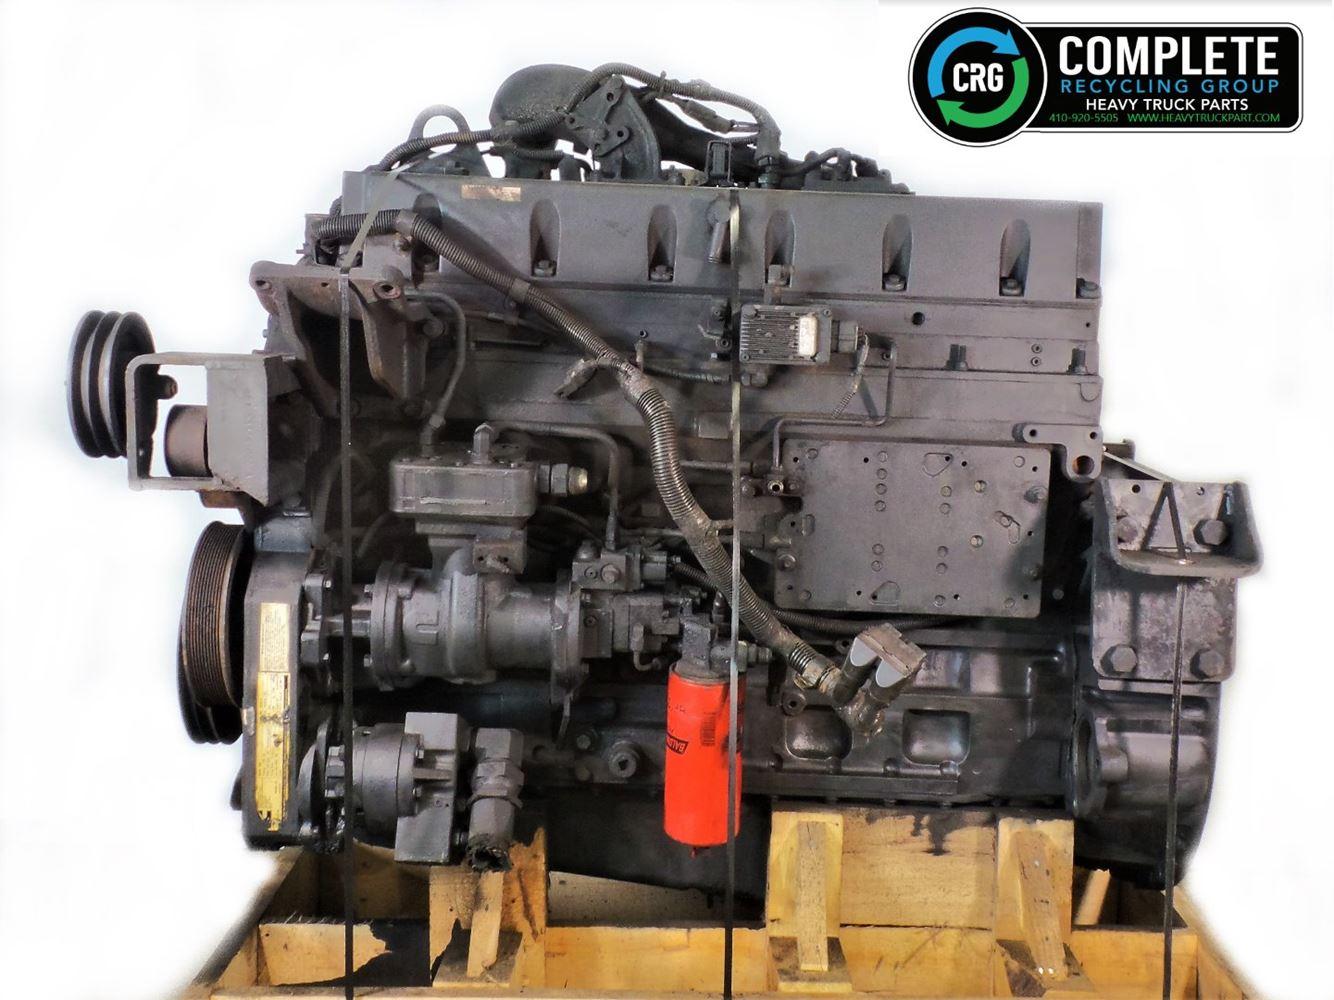 2004 CUMMINS M11 ENGINE ASSEMBLY TRUCK PARTS #679927